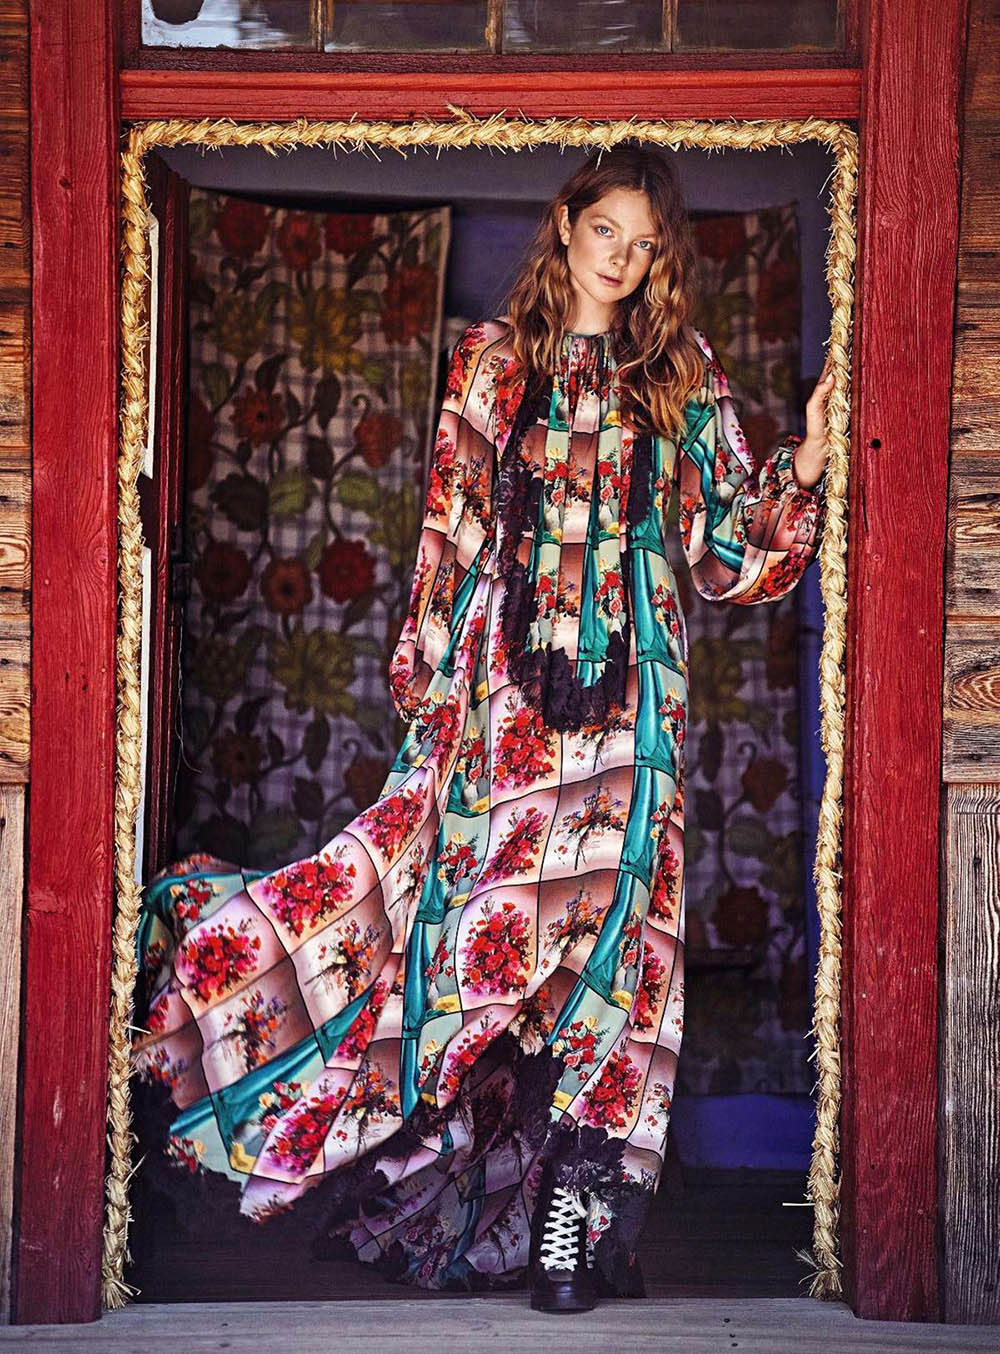 Eniko Mihalik by Marcin Tyszka for Harper's Bazaar Germany September 2018